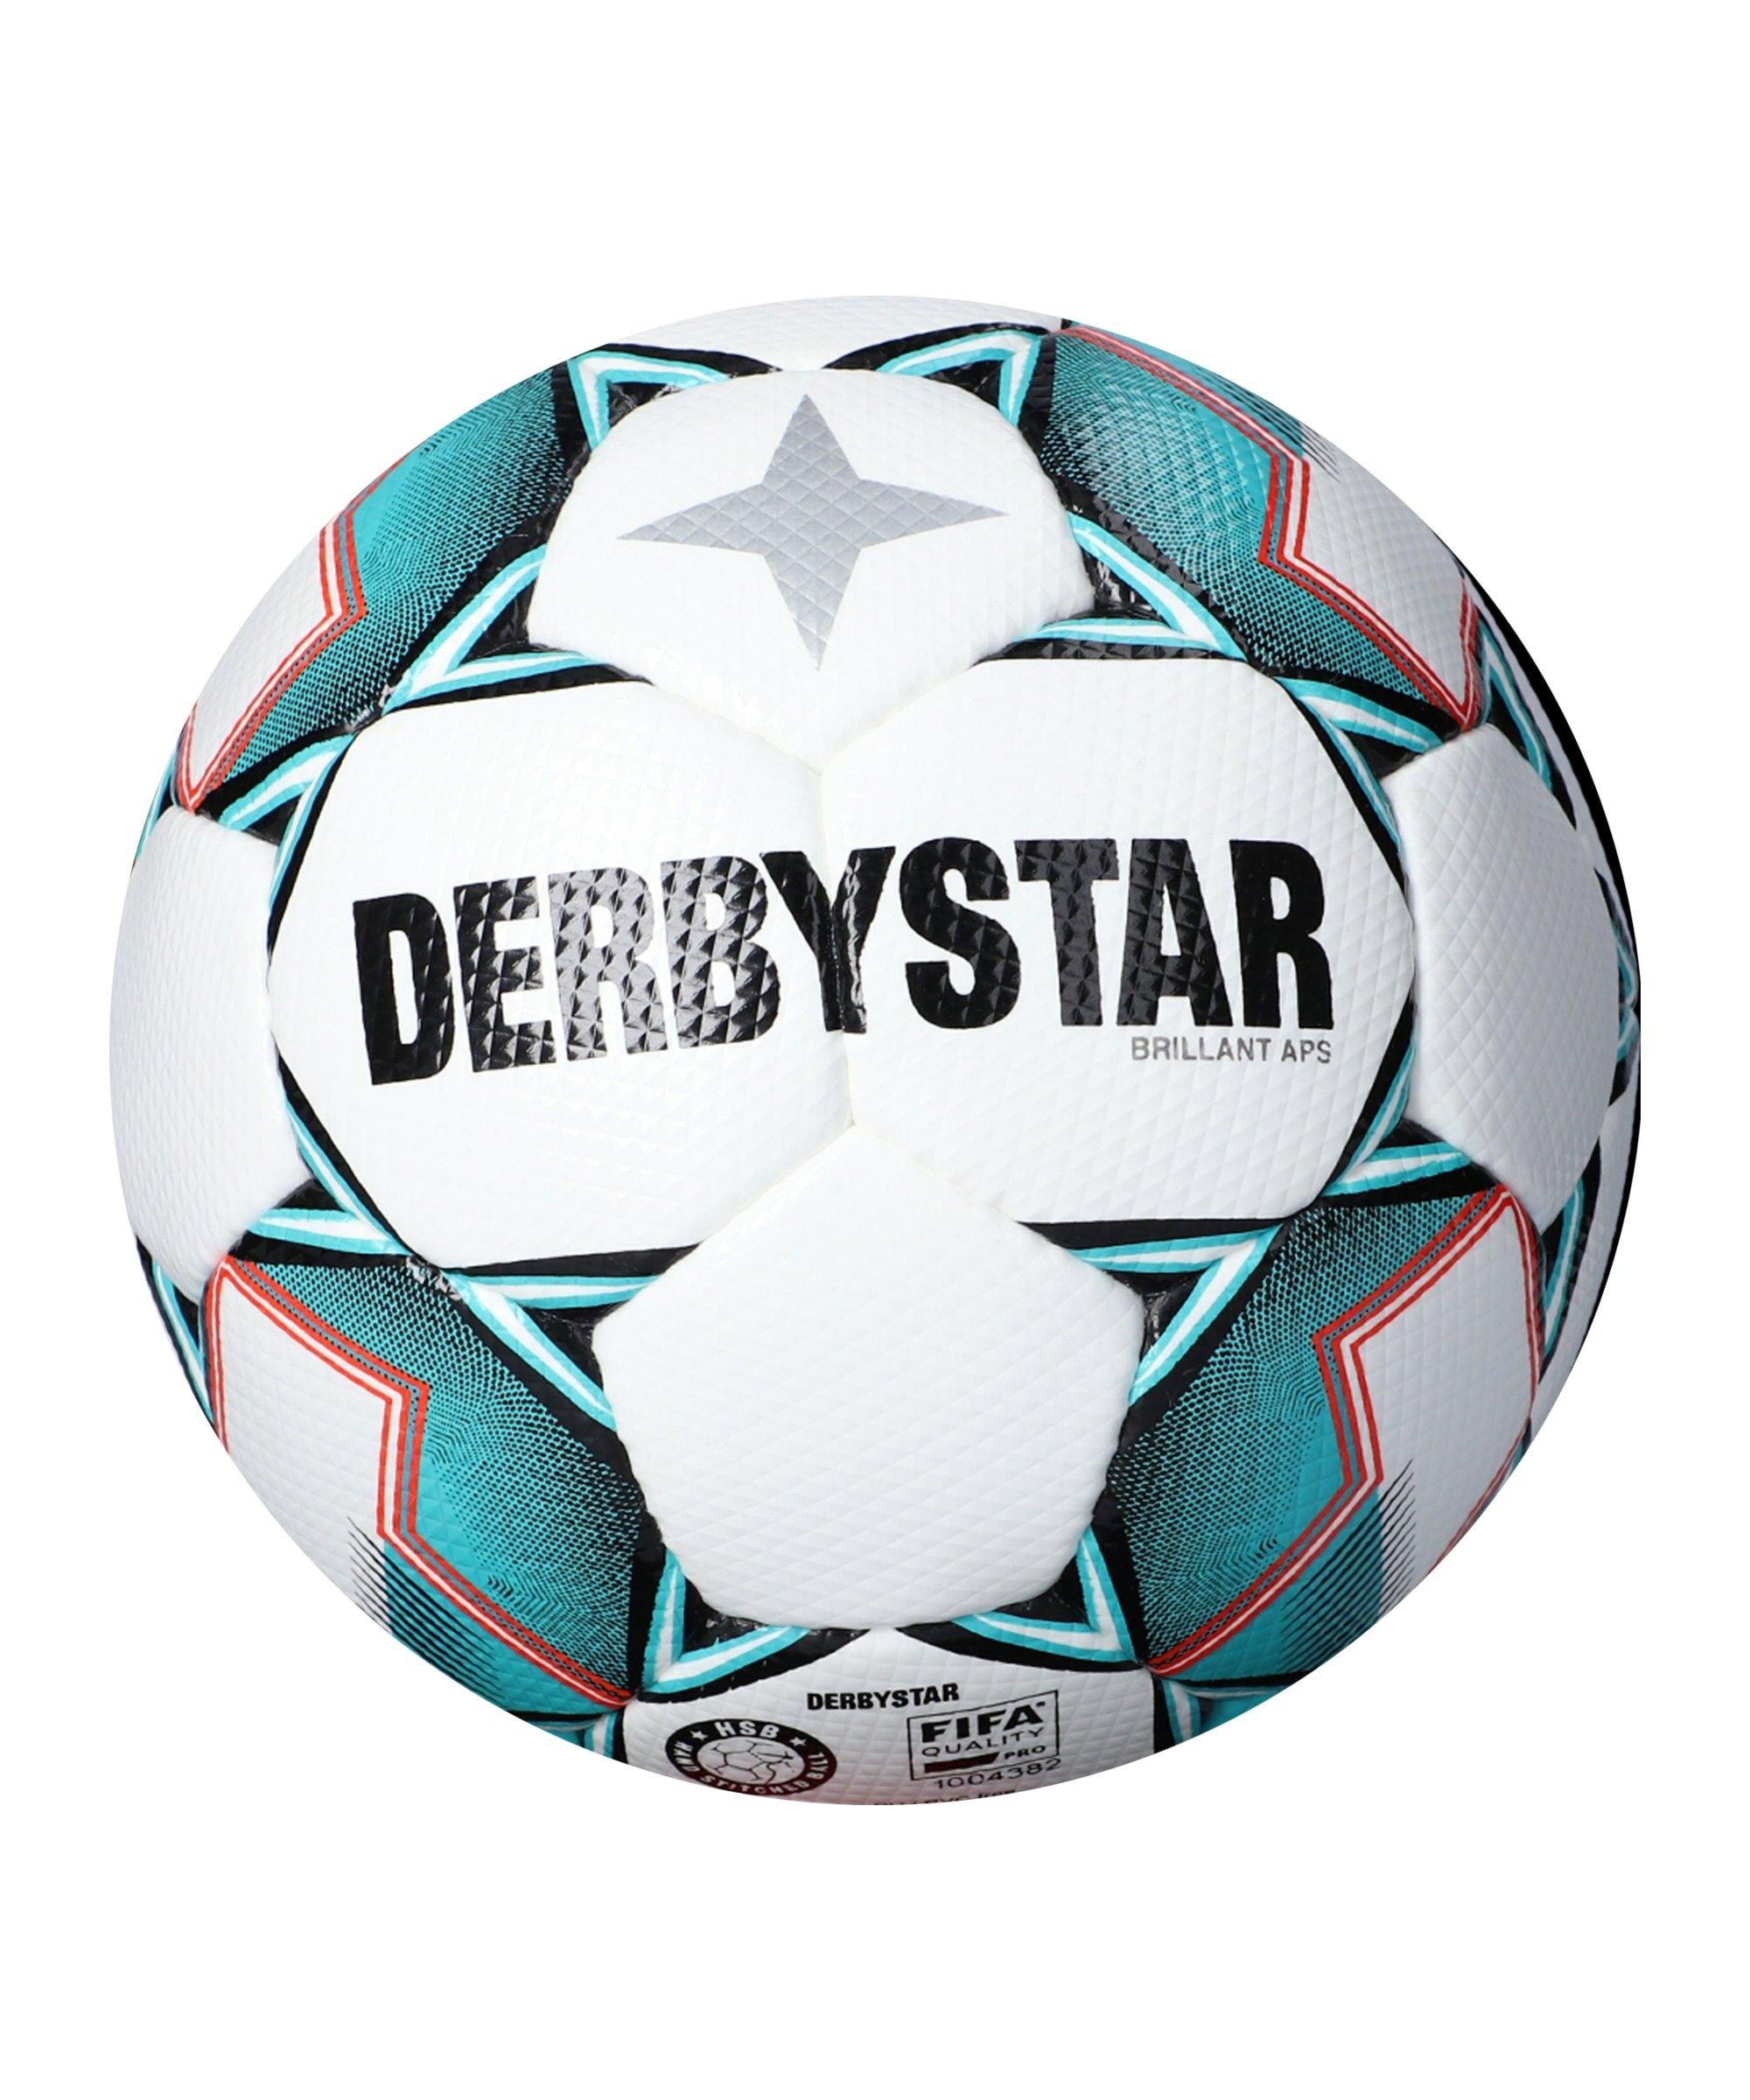 Derbystar Brillant APS V20 Spielball Weiss F142 - weiss